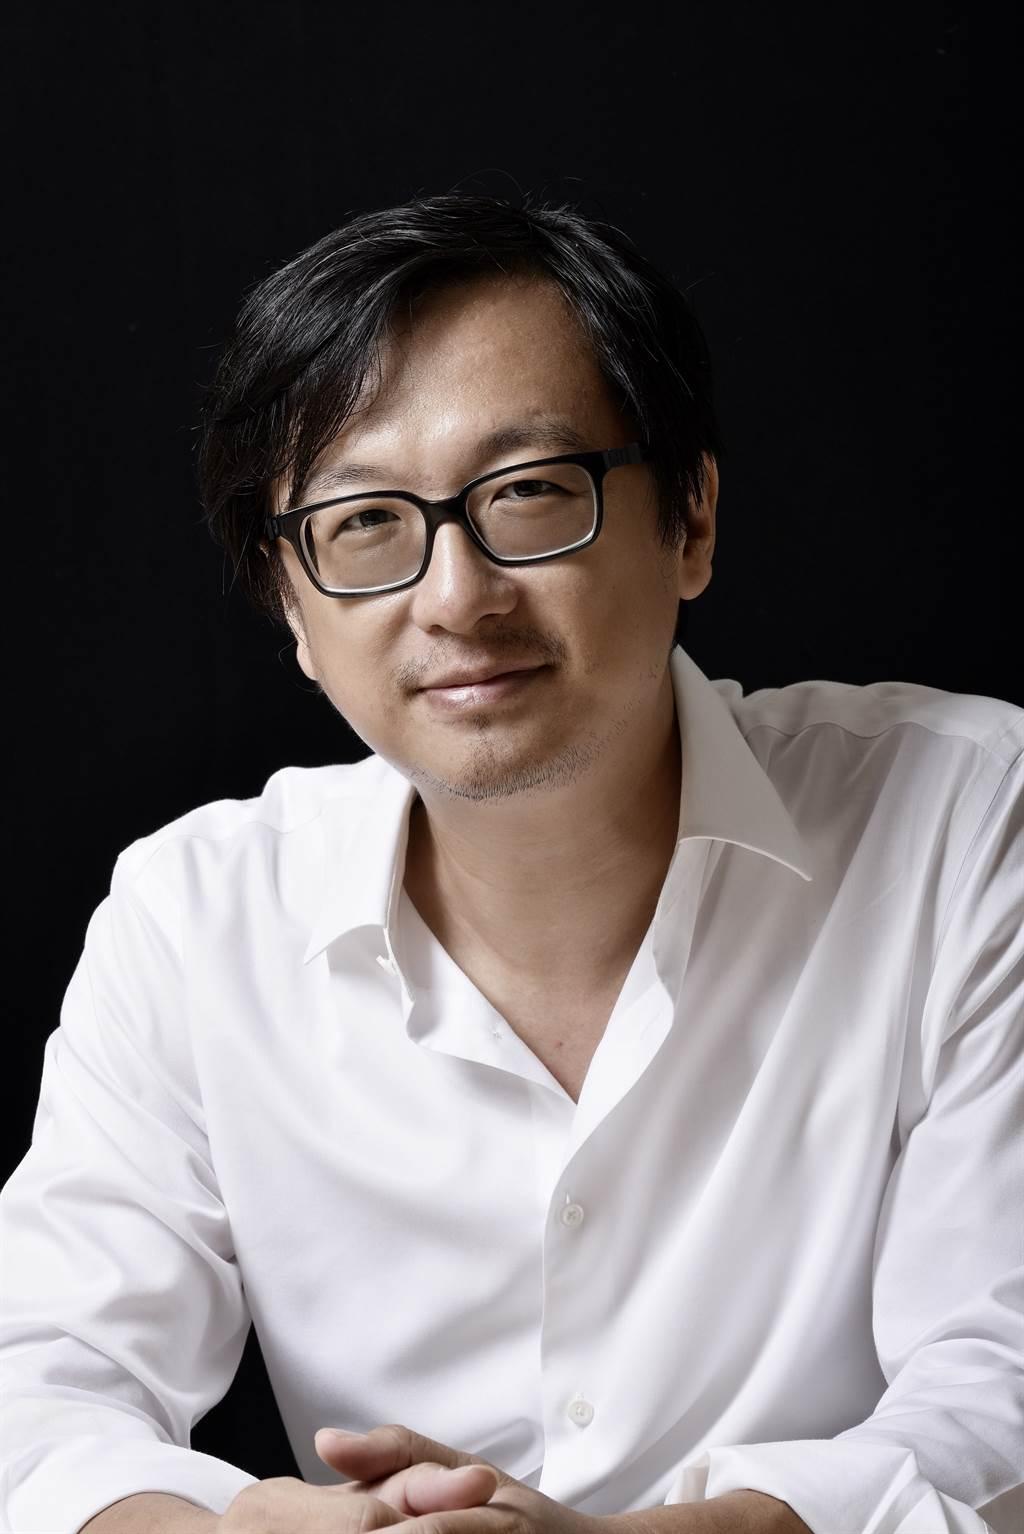 《MY WAY》由VERSE創辦人張鐵志主持,其曾歷任香港《號外》雜誌總編輯暨聯合出版人、《彭博商業週刊中文版》創刊總主筆、《數位時代》首席顧問、《報導者》暨總主筆。